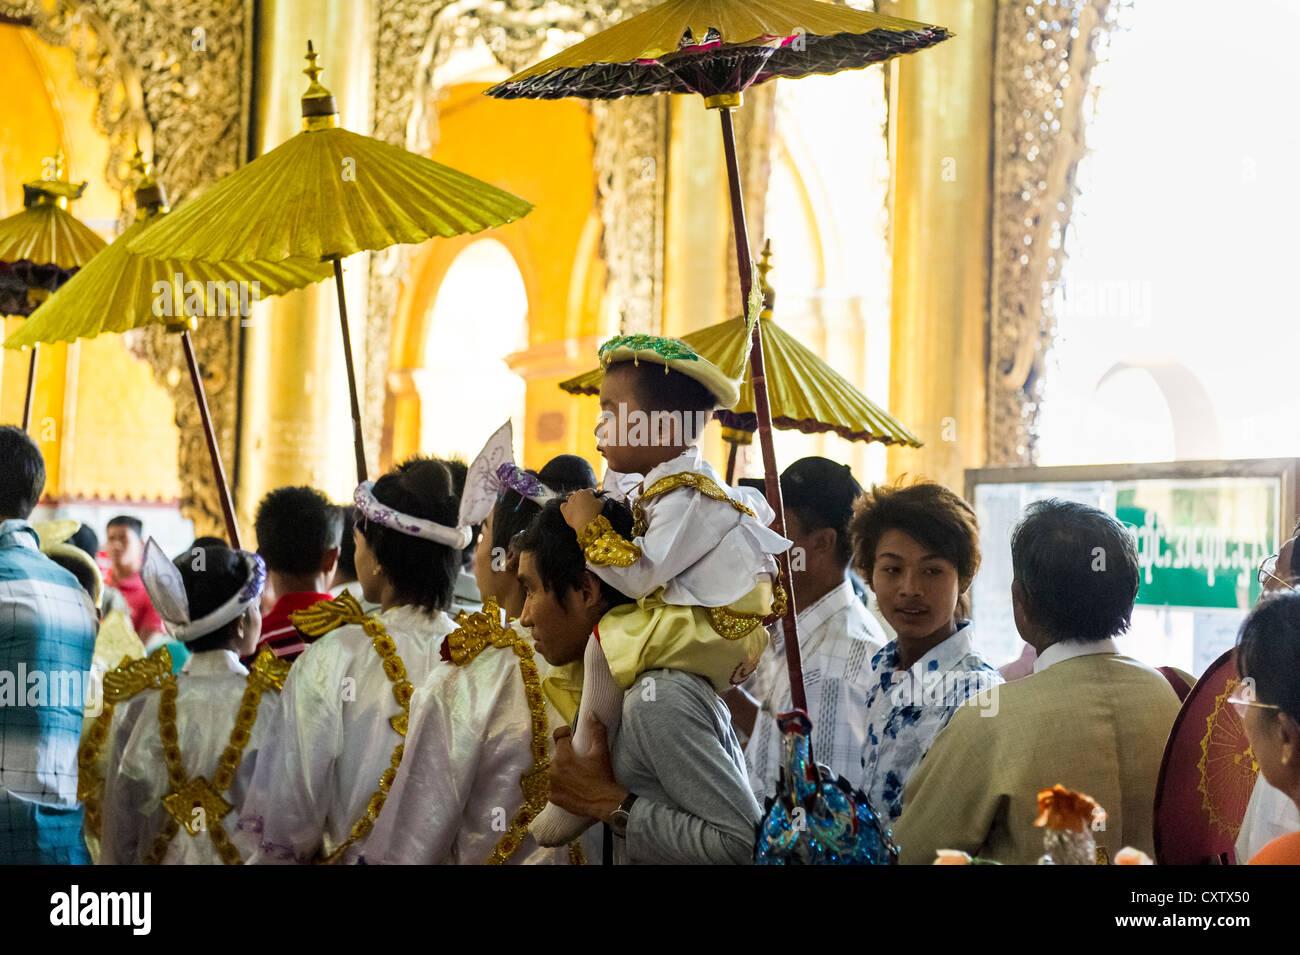 Novize Mönchszeremonie im Mahamuni Buddha Tempel in Mandalay. Myanmar Birma Stockfoto